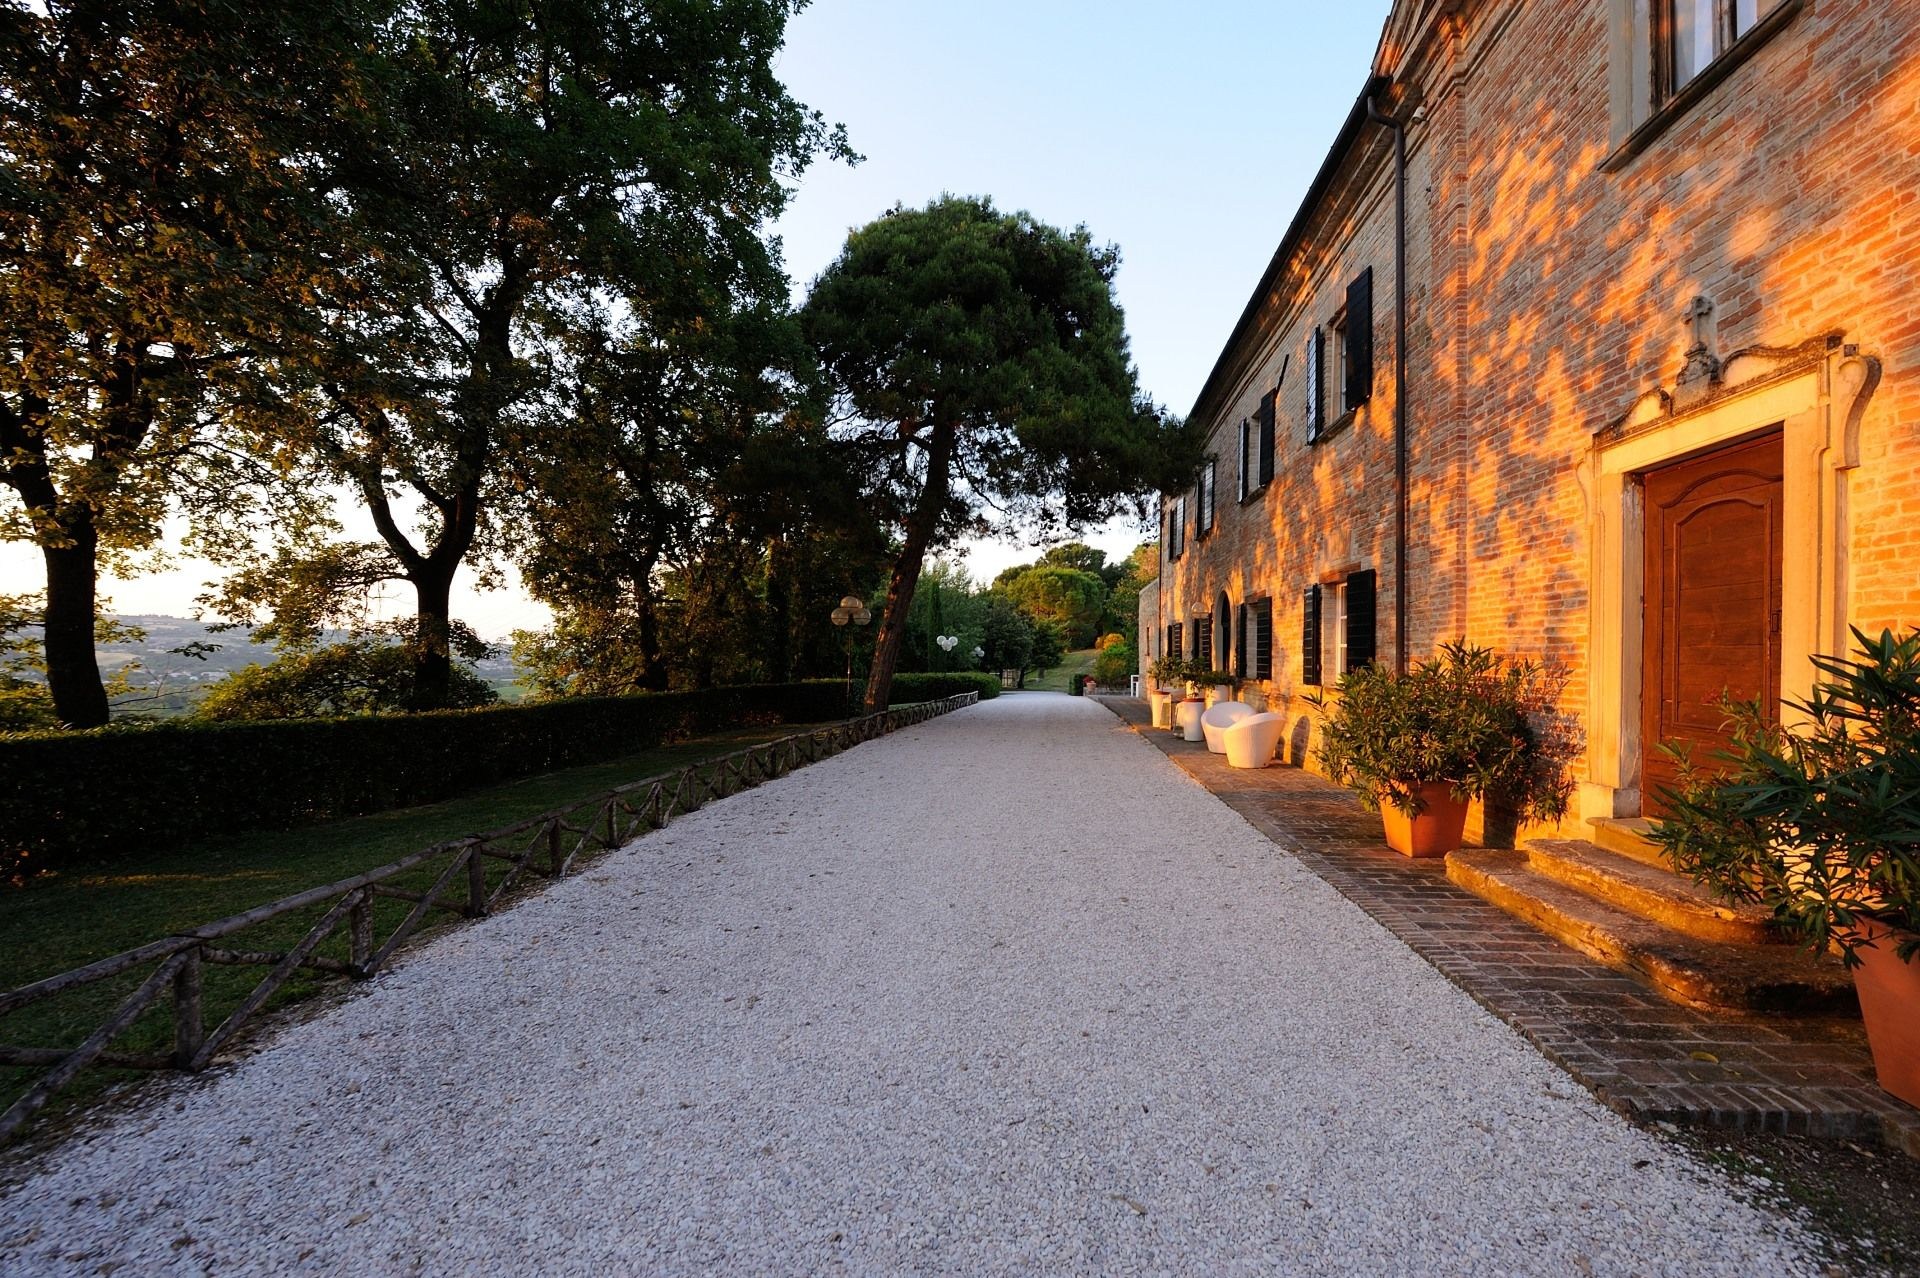 Tombolina Relais - Villa Tombolina photo 18692122